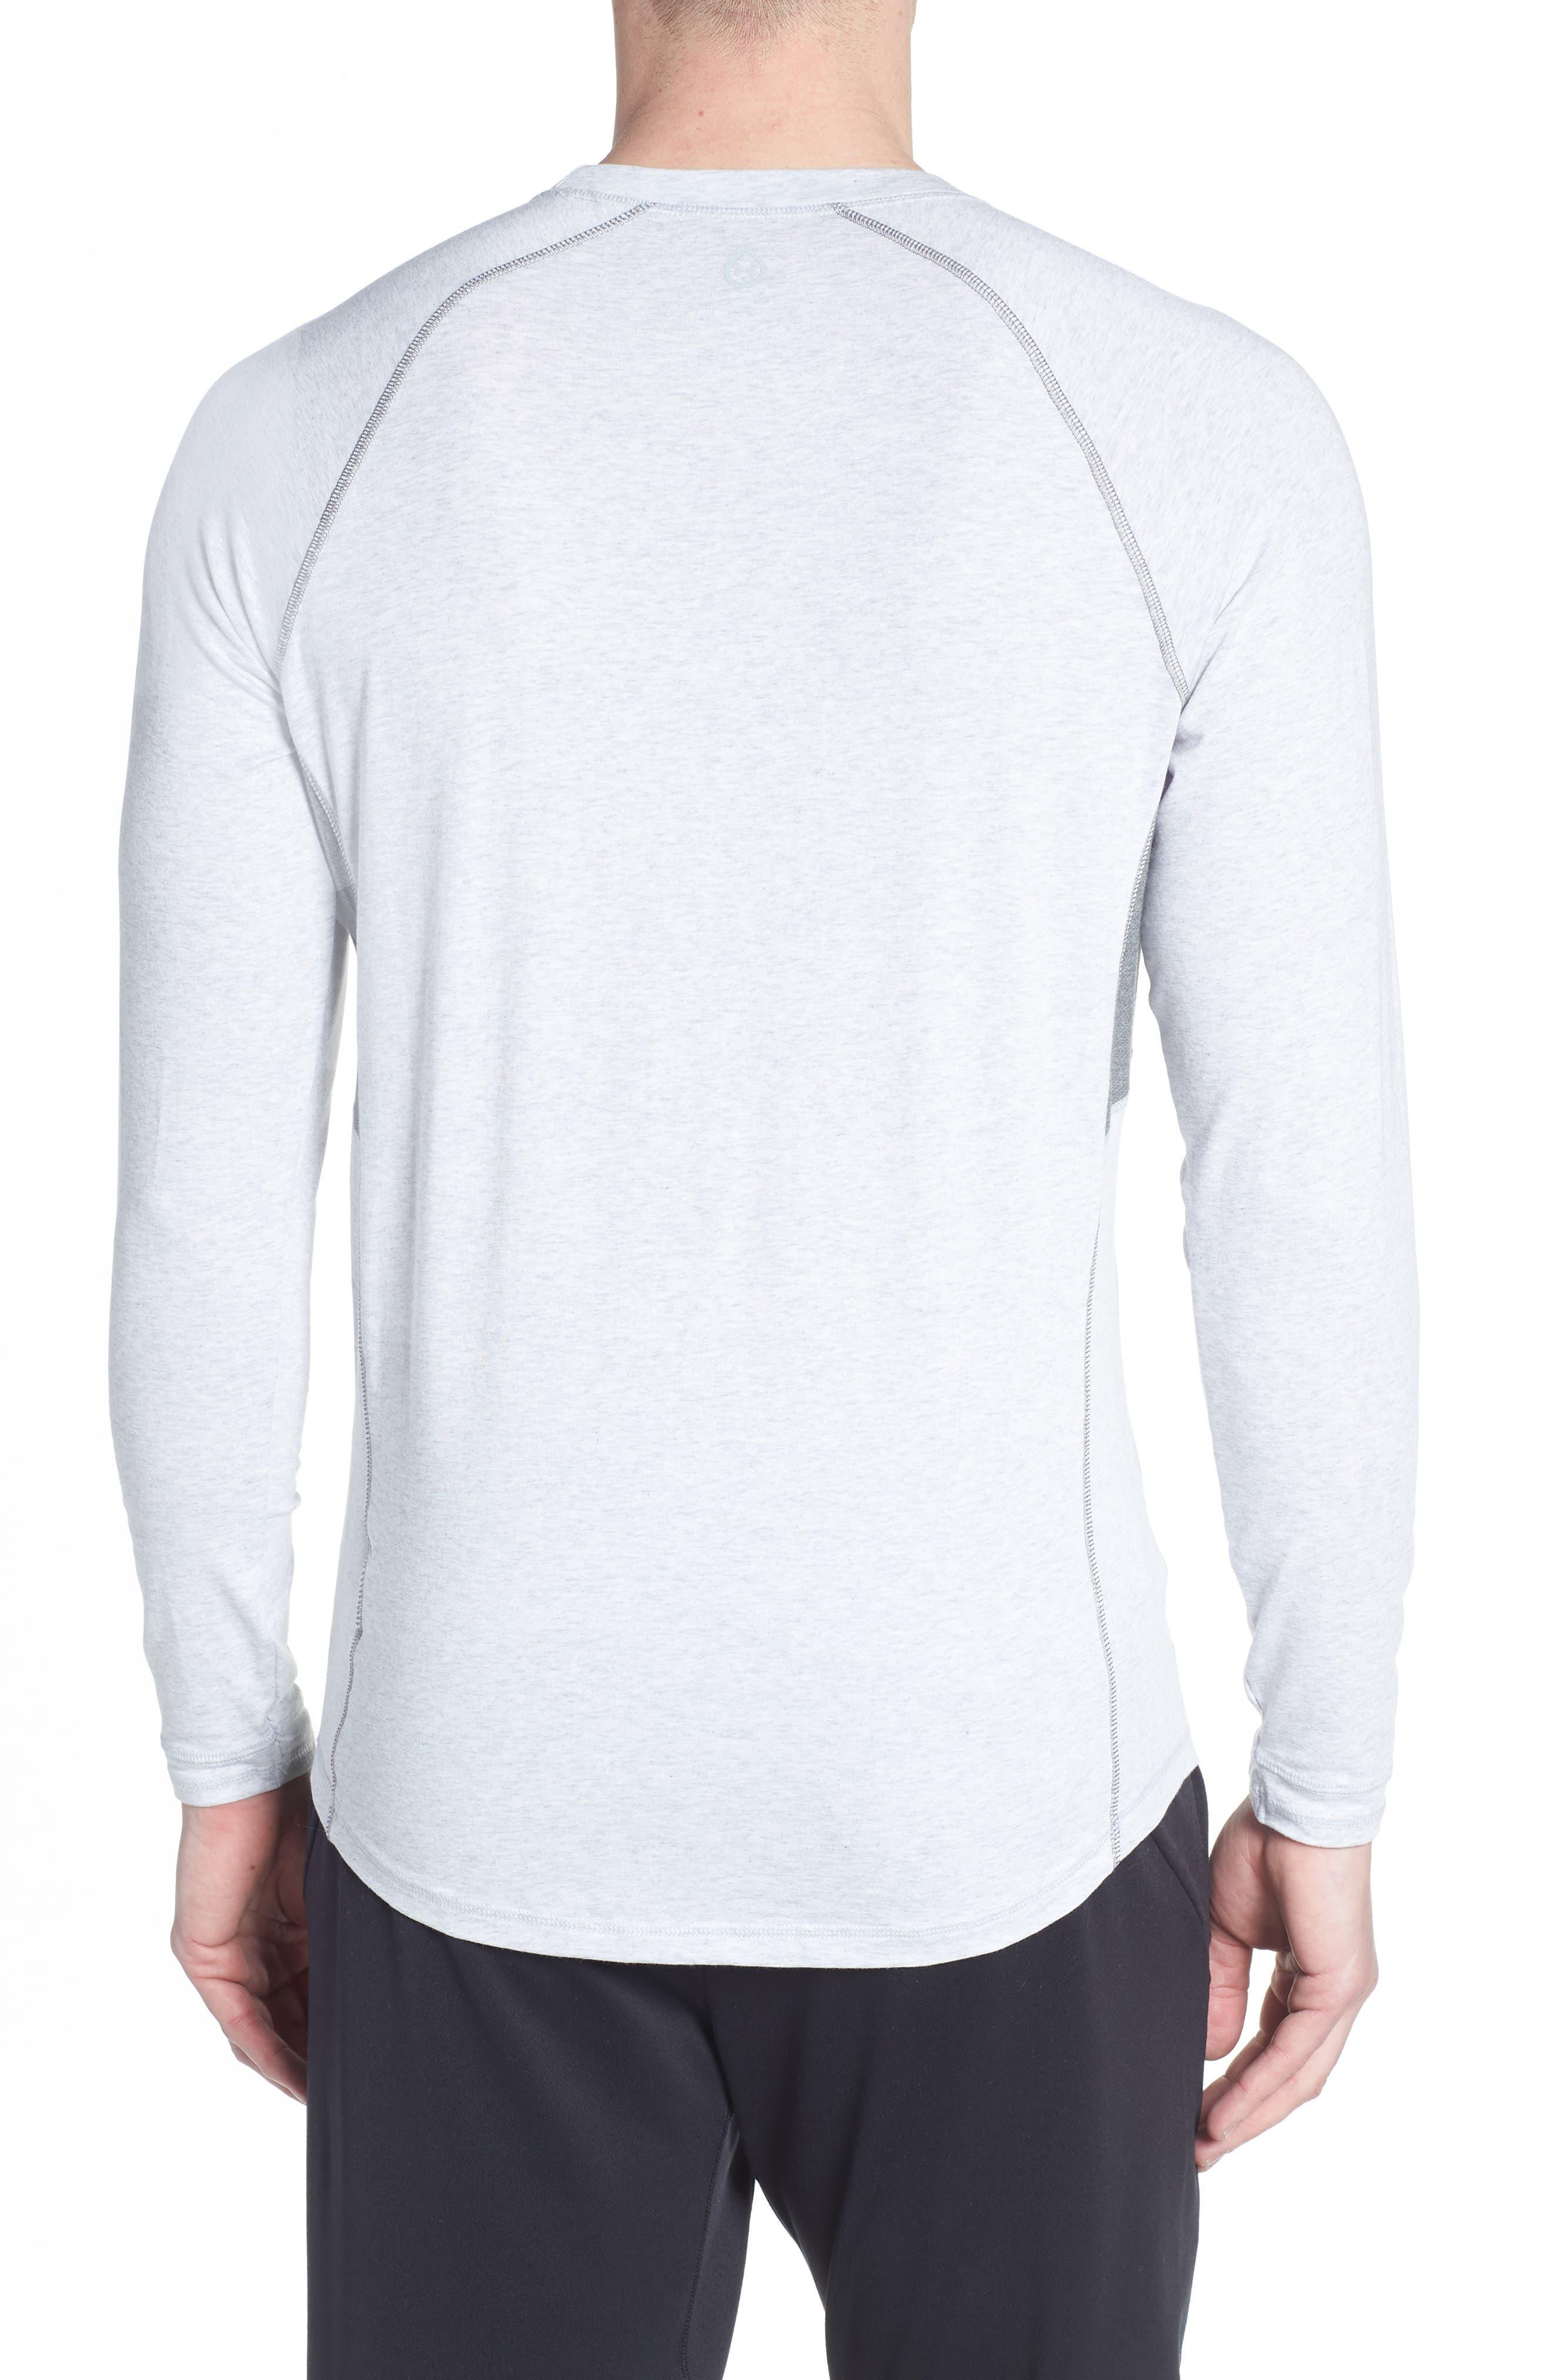 Charge II Long Sleeve Shirt,                             Alternate thumbnail 2, color,                             Light Heather Gray